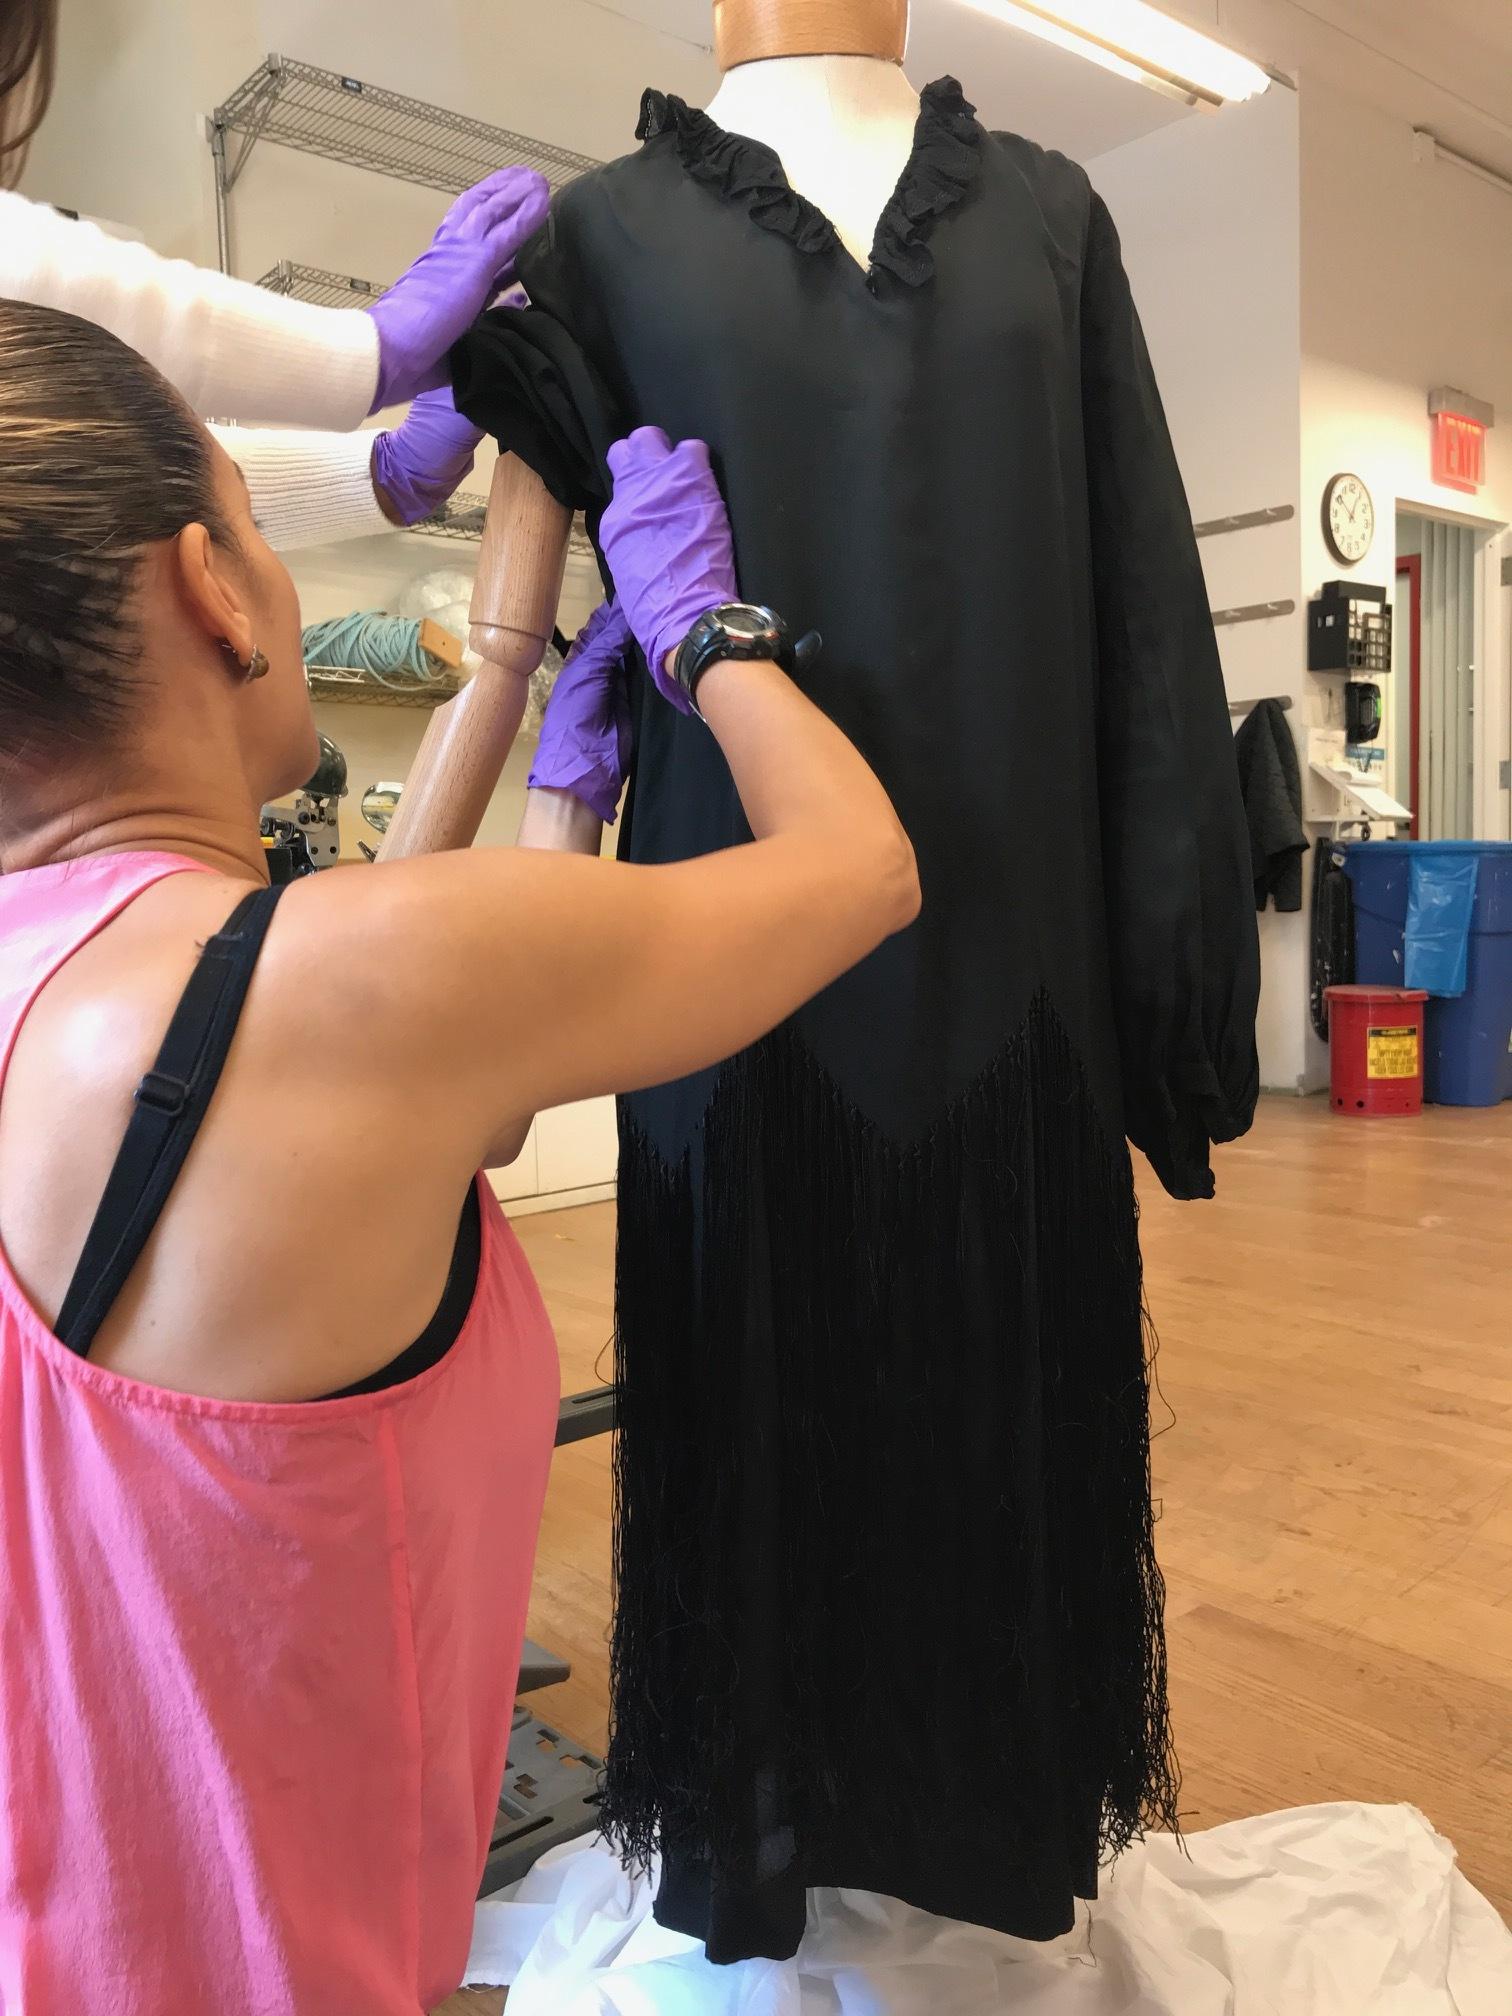 Silent film costume found in Fort Lee, NJ